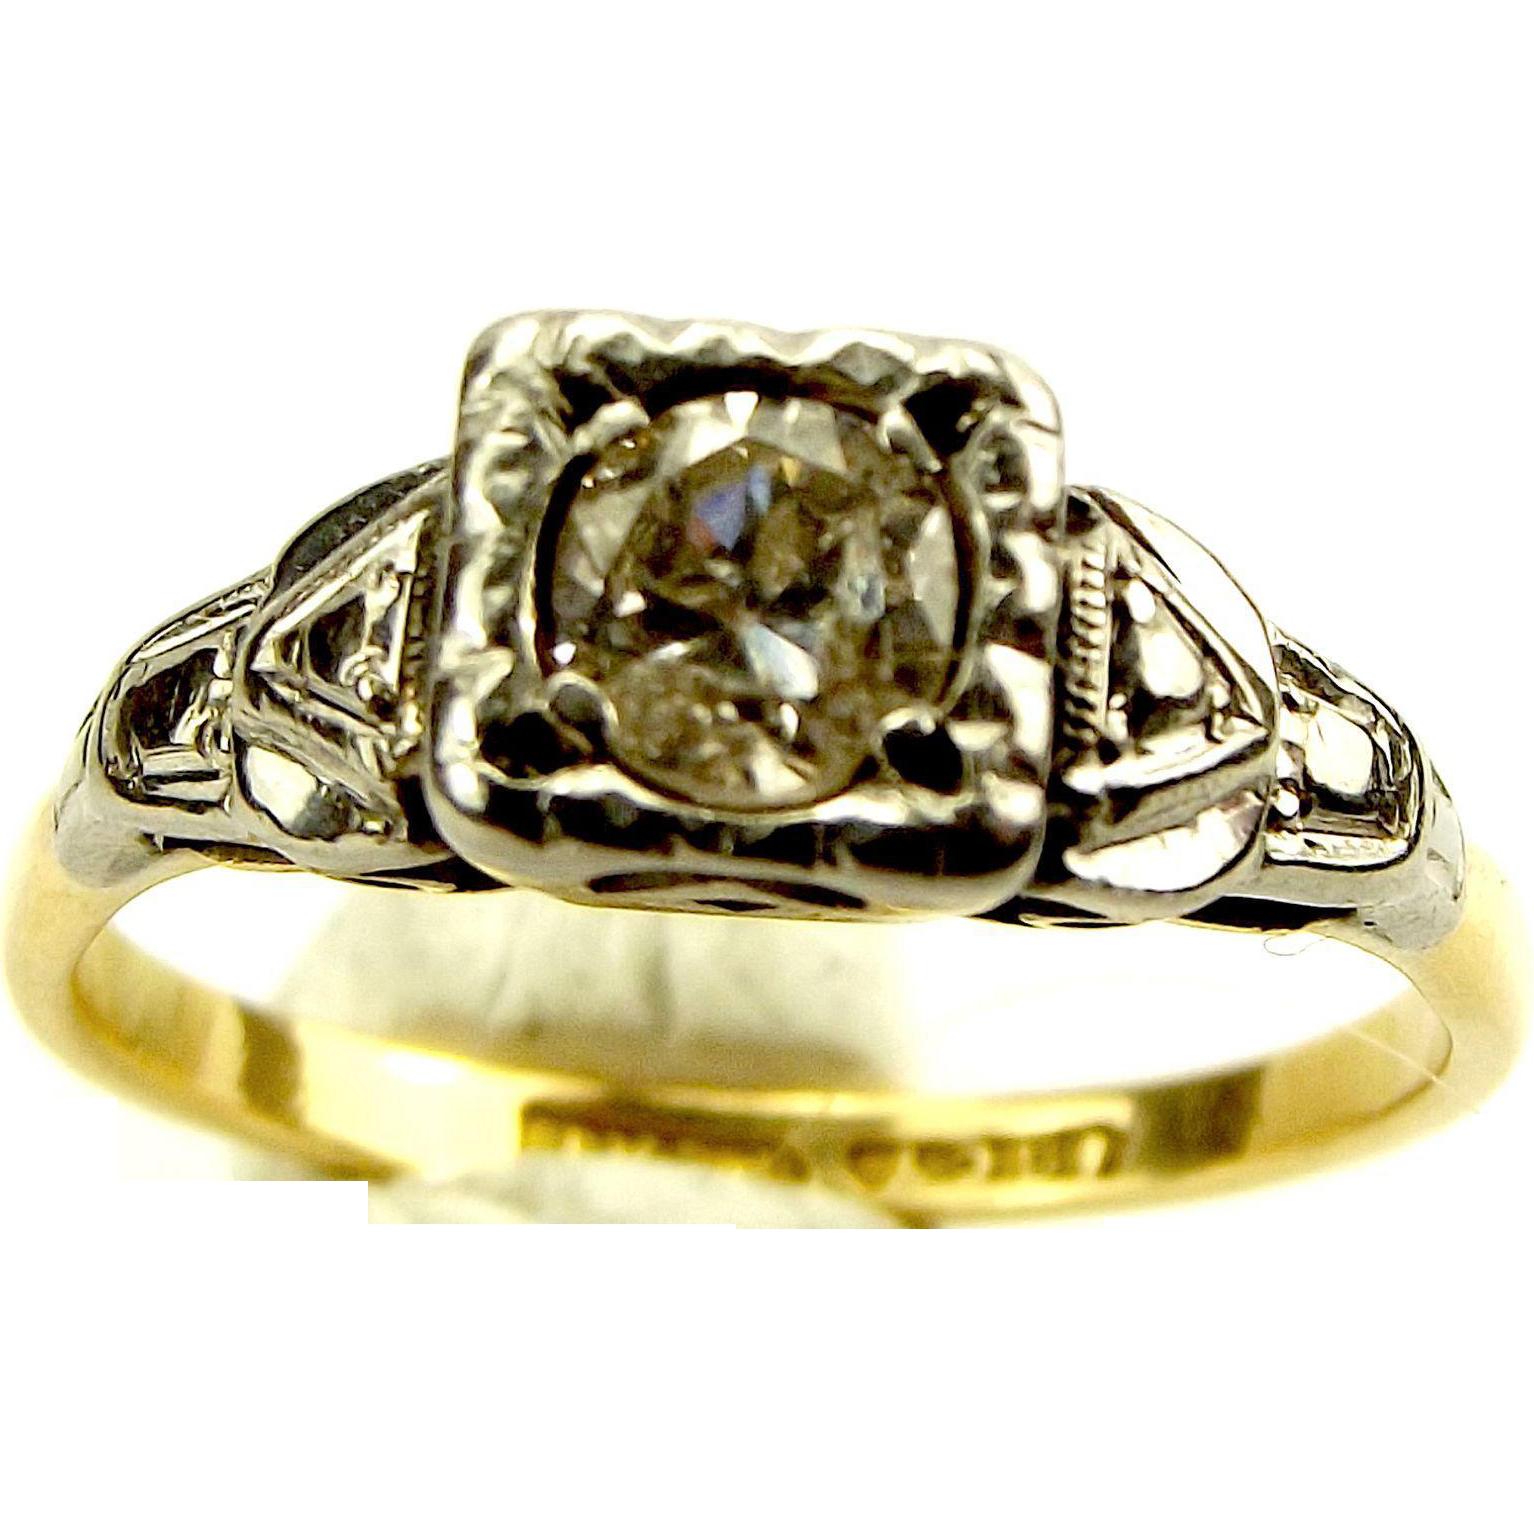 Beautiful Art Deco 18ct Gold, Platinum & 20-25 Point Diamond Ring